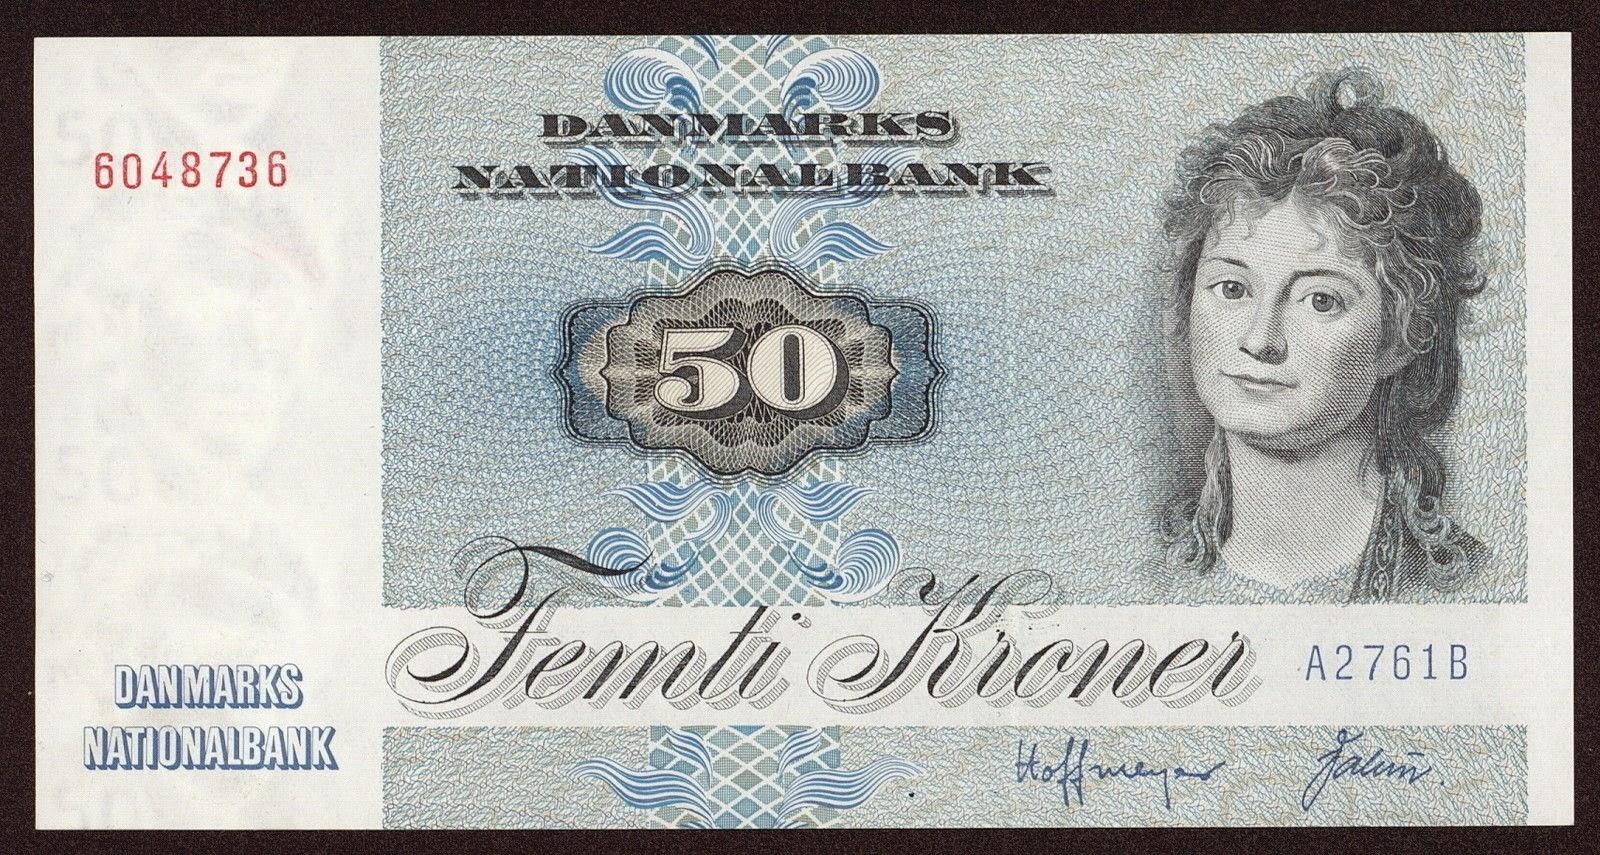 Banknotes of Denmark 50 krone banknote 1972 Engelke Charlotte Ryberg